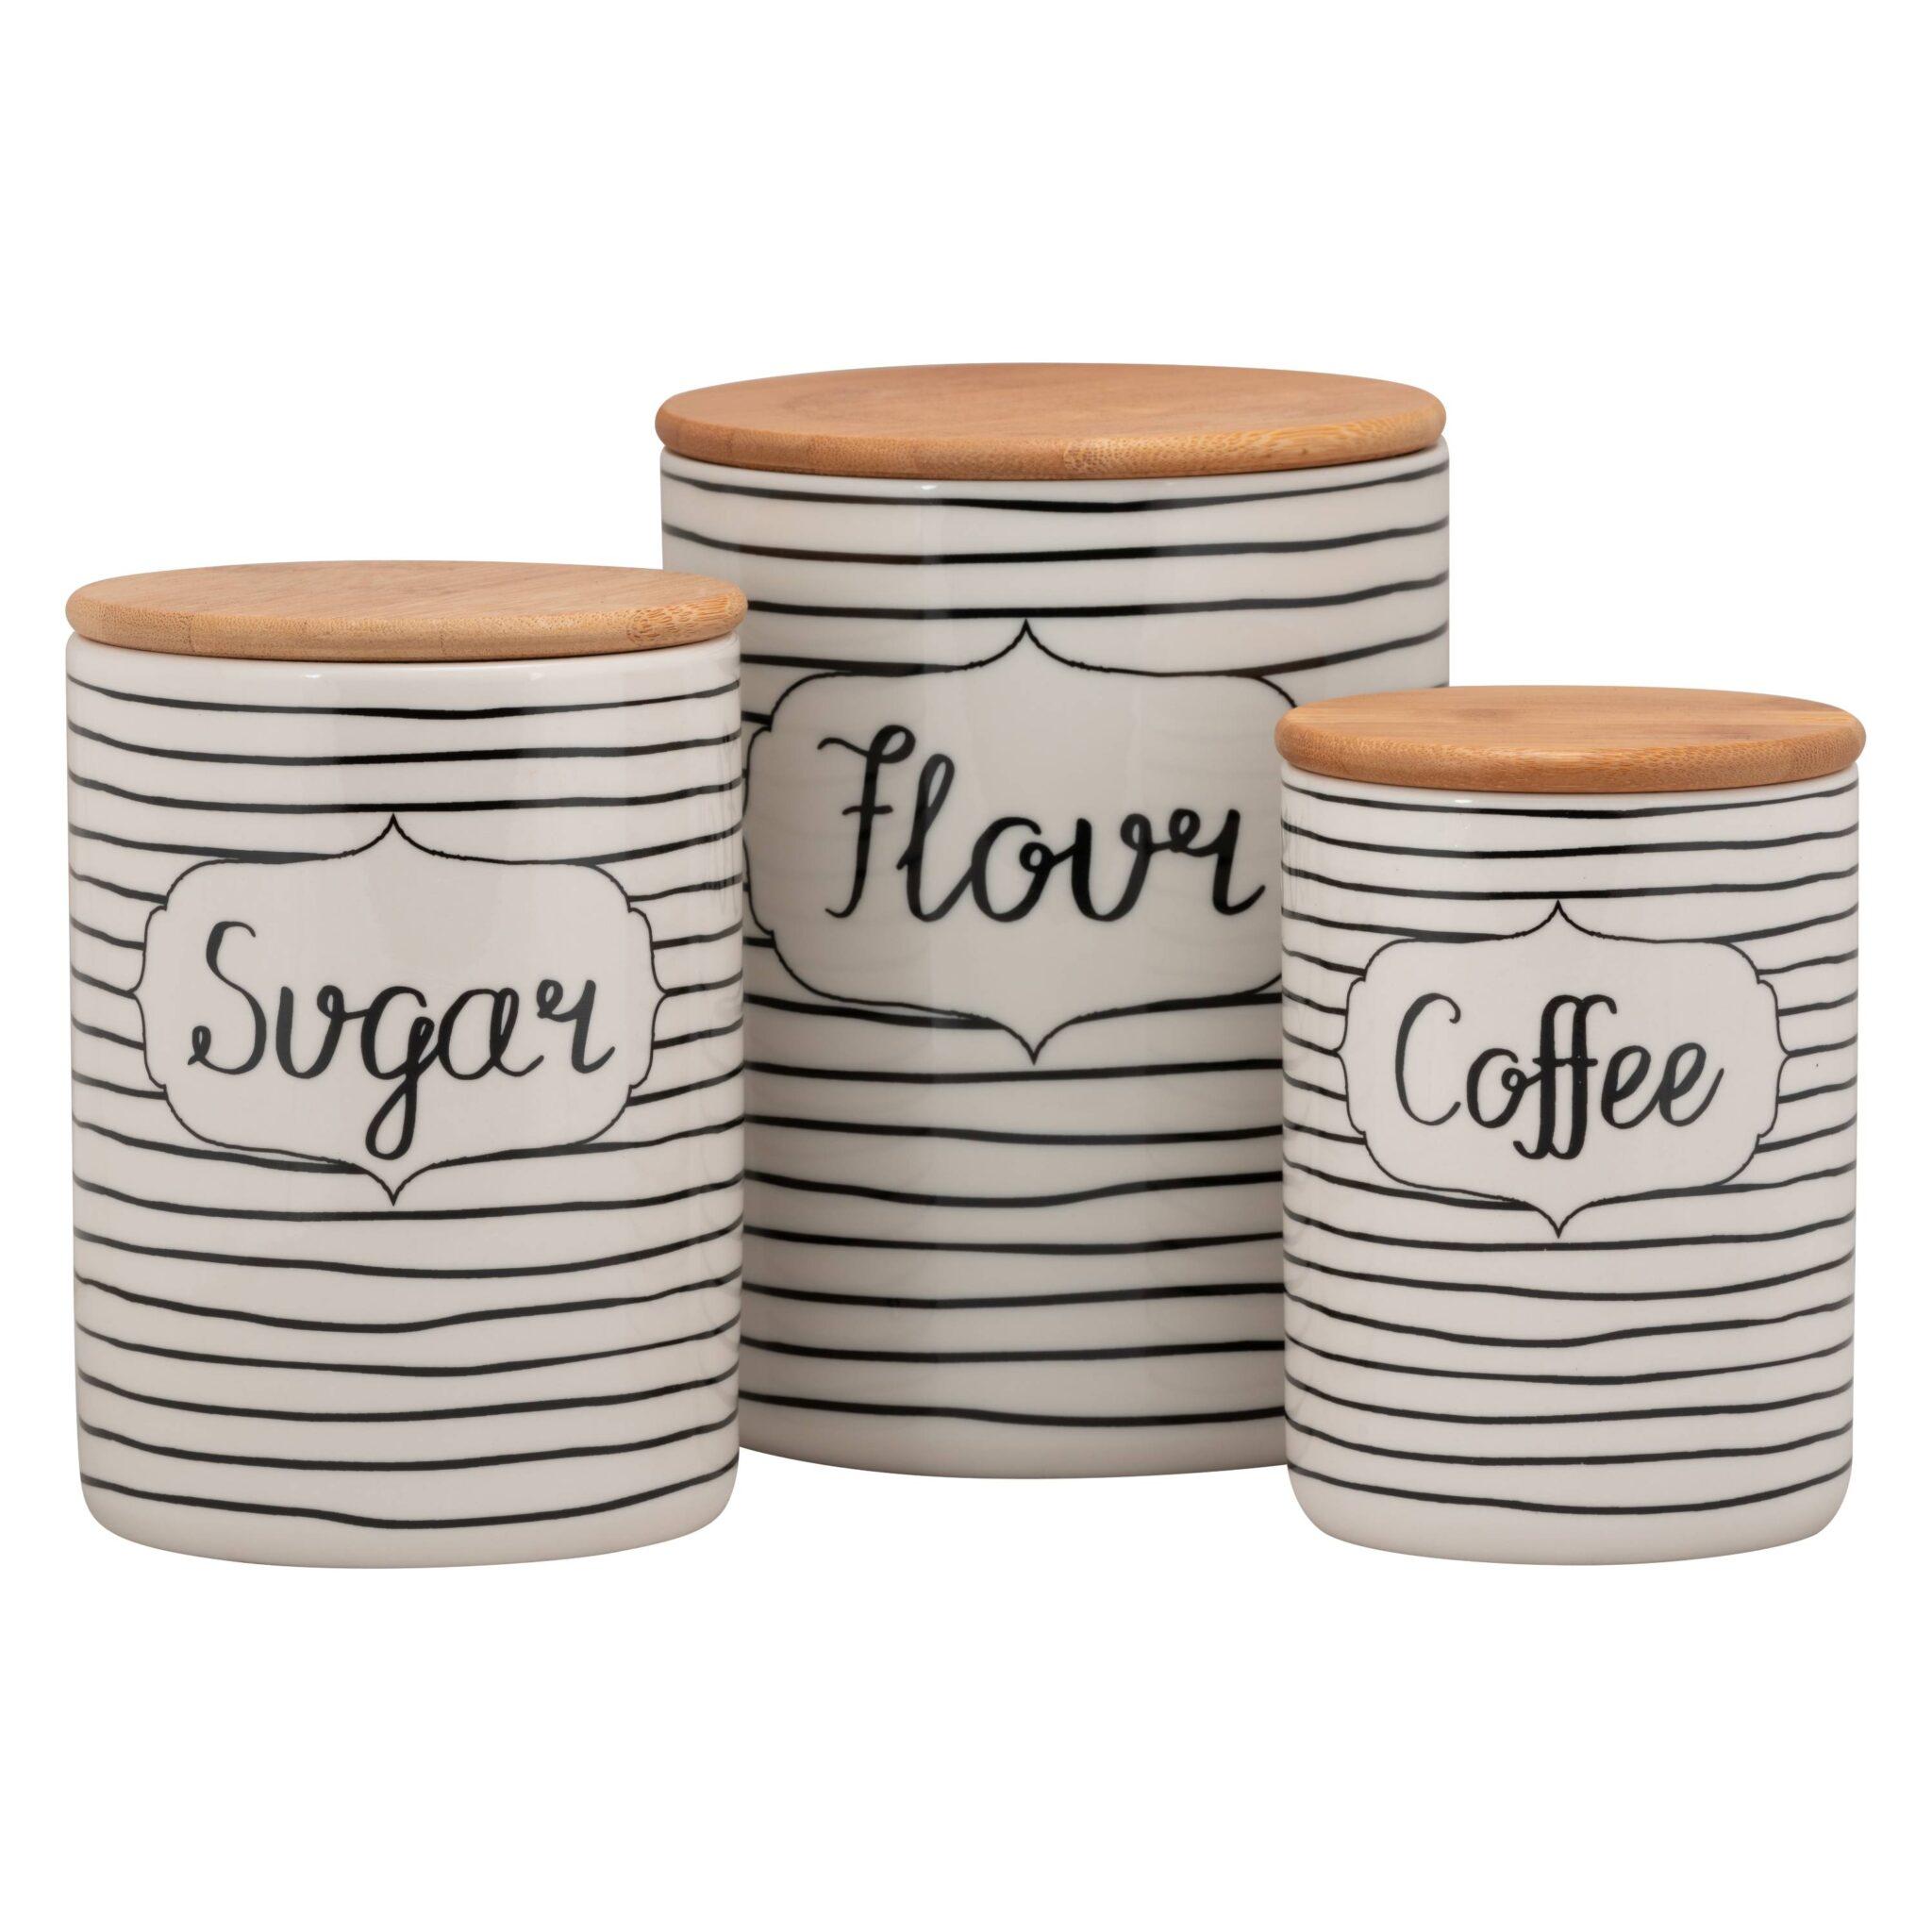 10 Strawberry Street Everyday Coffee, Sugar, Flour 3 Piece Porcelain Canister Set, White/Black $26.99